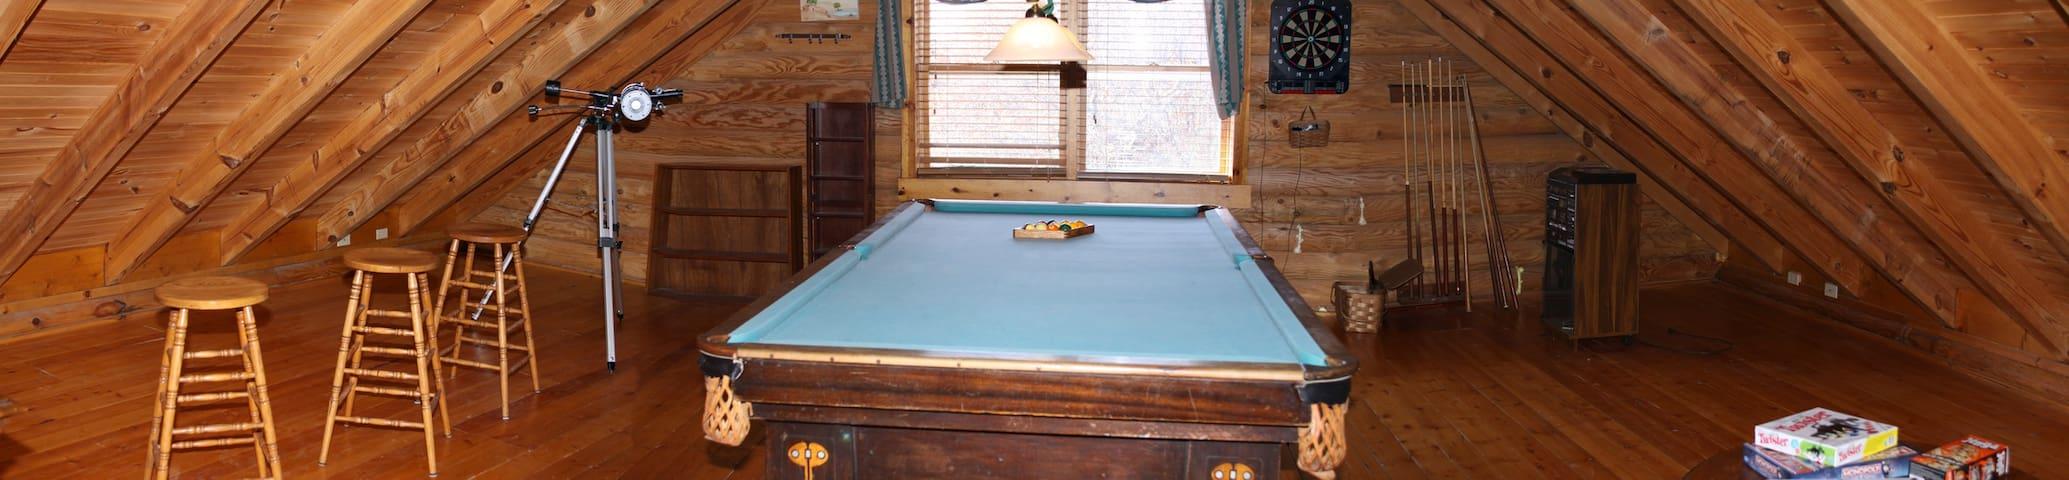 Village Inn and Lodge, price per room per night. - Ringwood - Bed & Breakfast